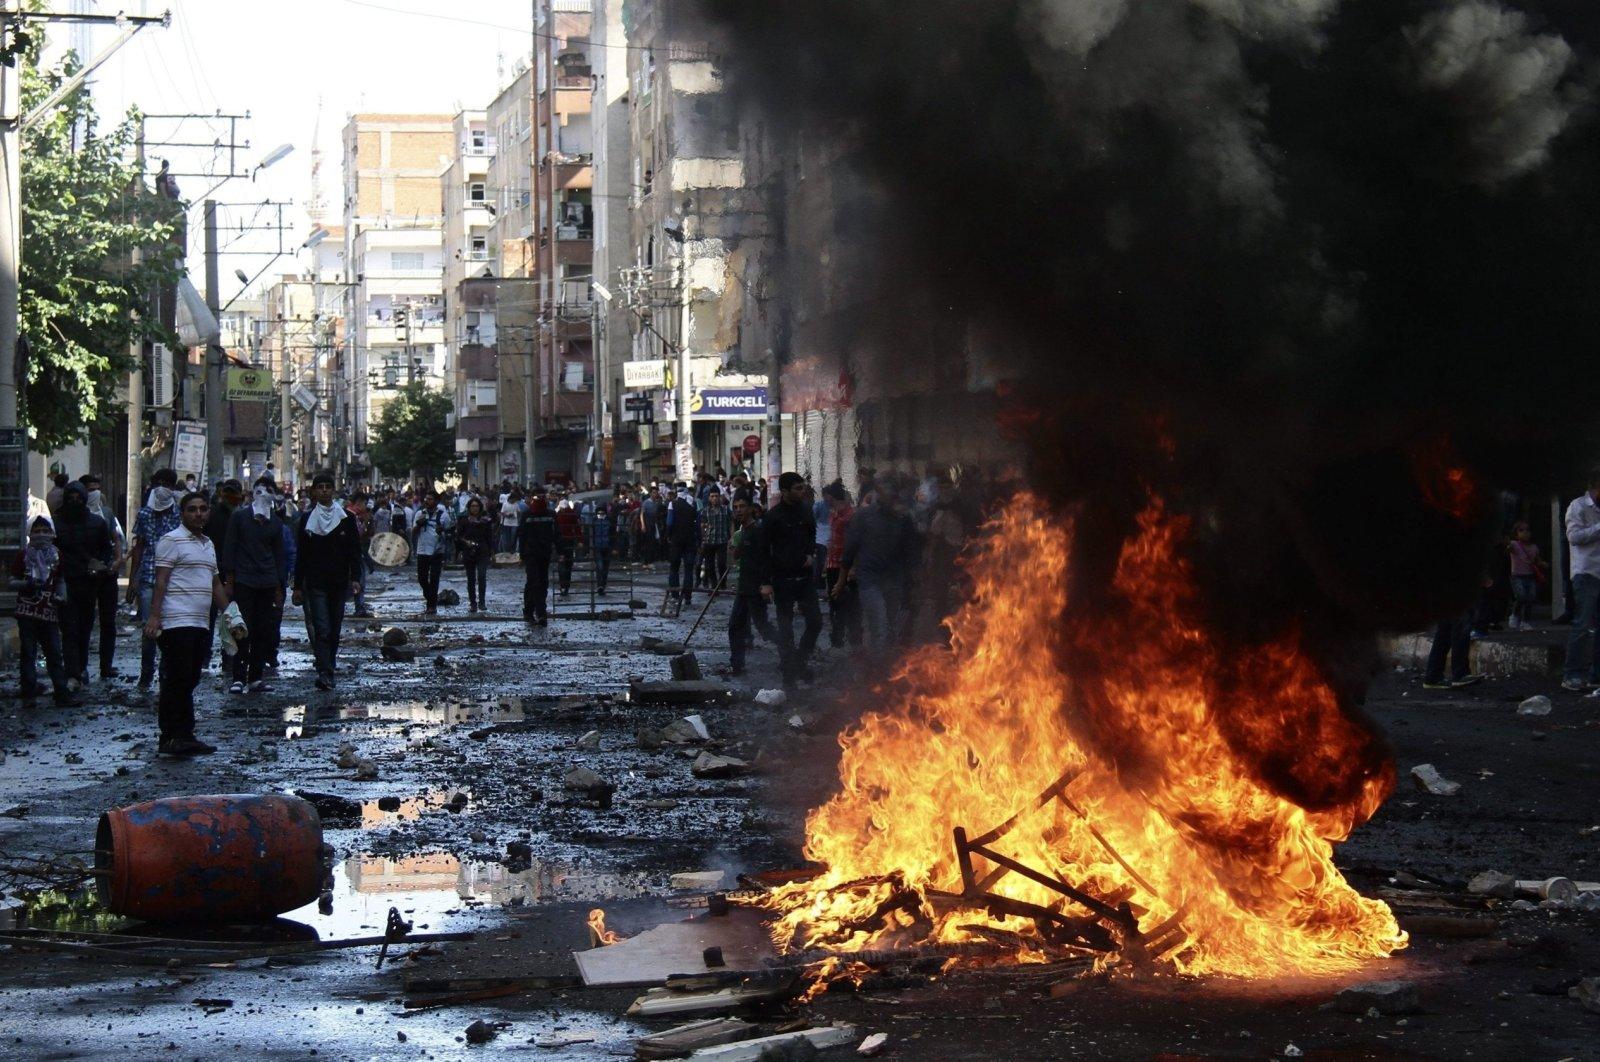 Violent pro-PKK demonstrators set the city's streets on fire during protests in Diyarbakır, southeastern Turkey, Oct. 7, 2014. (EPA Photo)